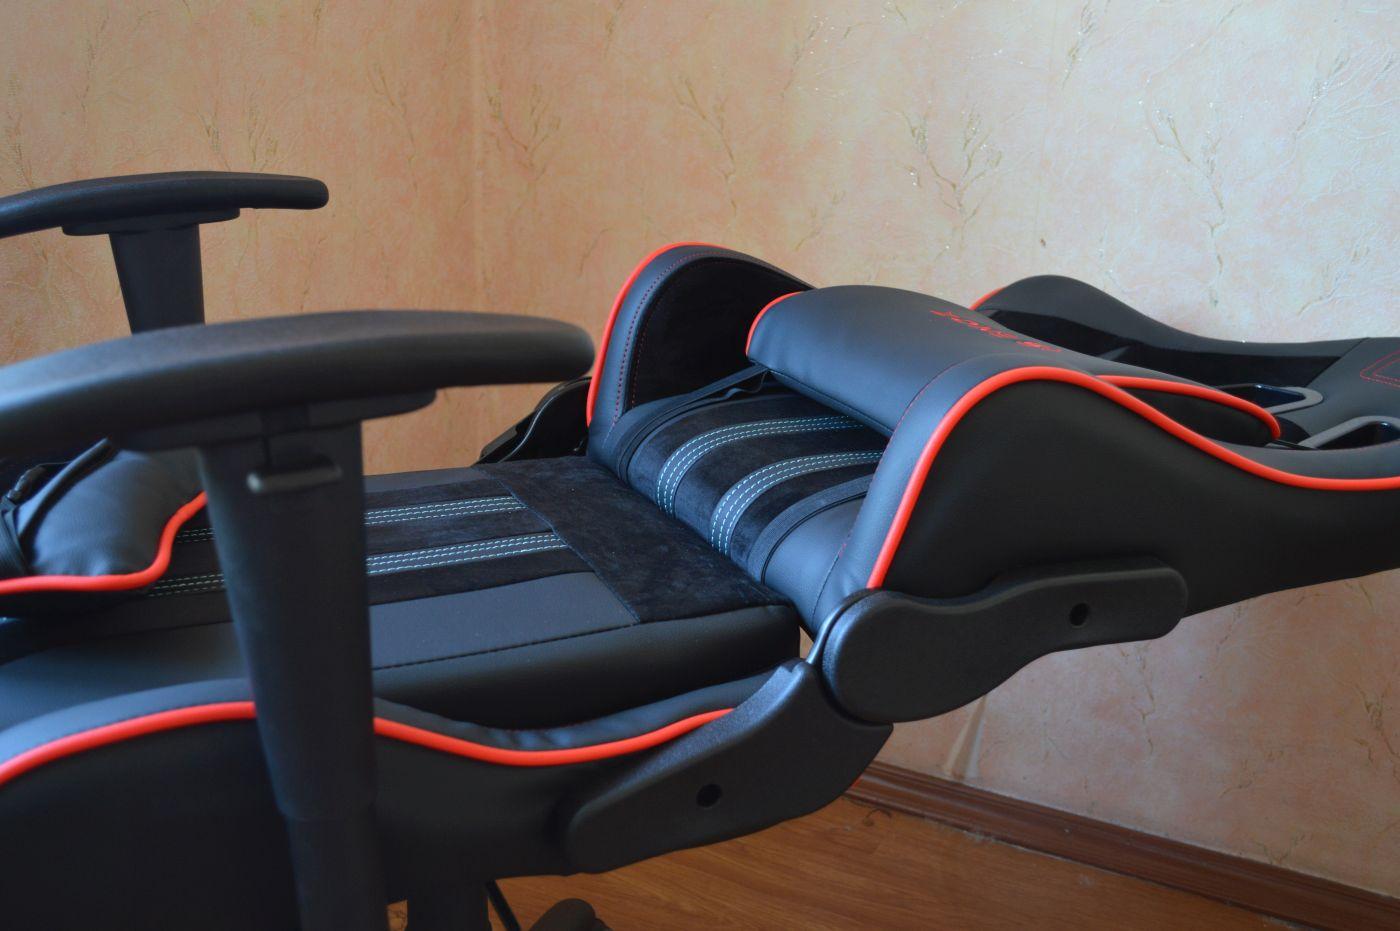 компьютерного игрового кресла Zone 51 Gravity разложено